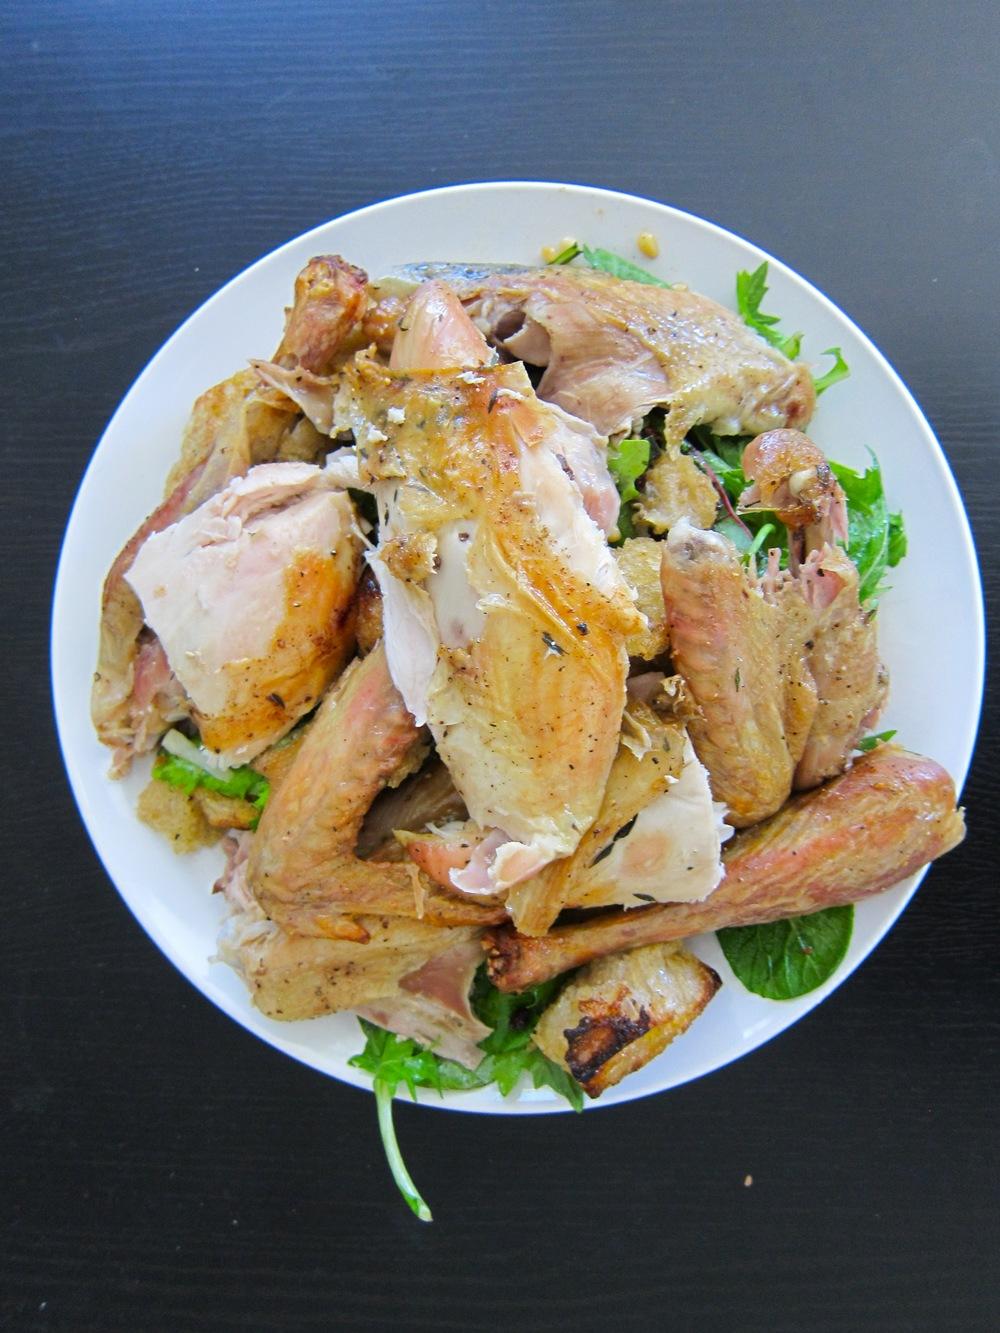 Zuni Cafe's Roast Chicken & Bread Salad